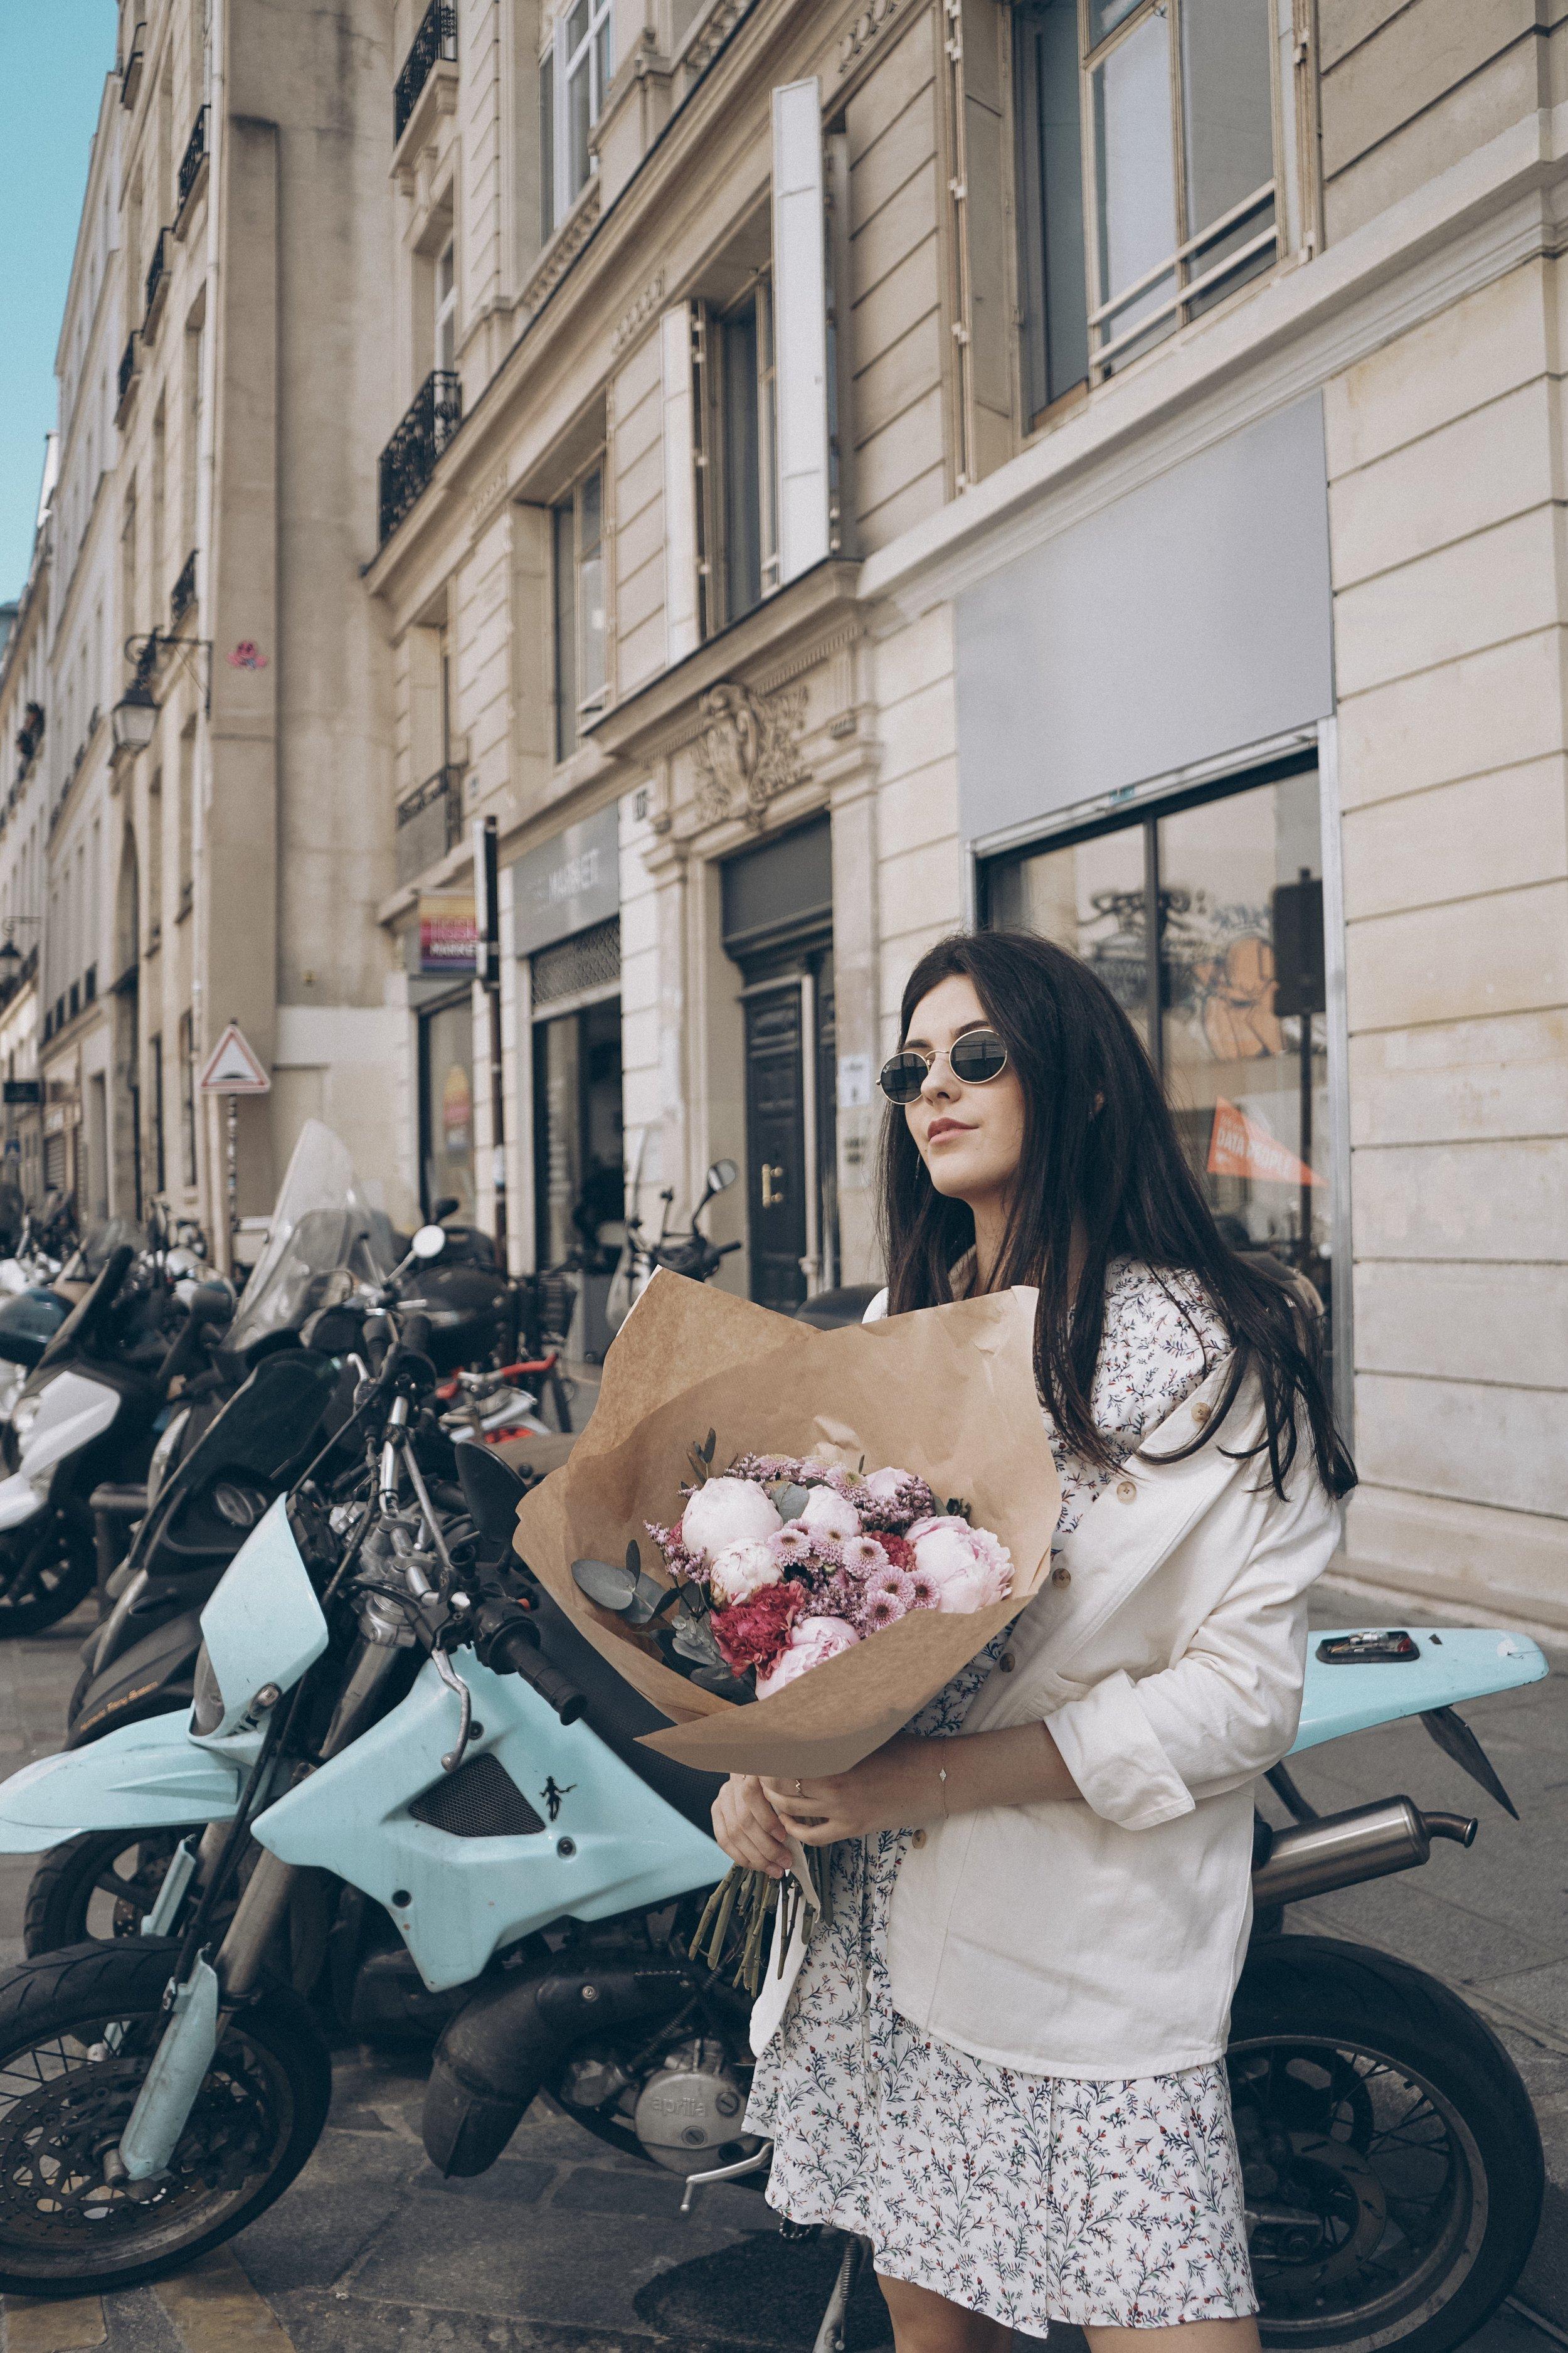 Paris for the Weekend Julia Friedman wearing Sezane